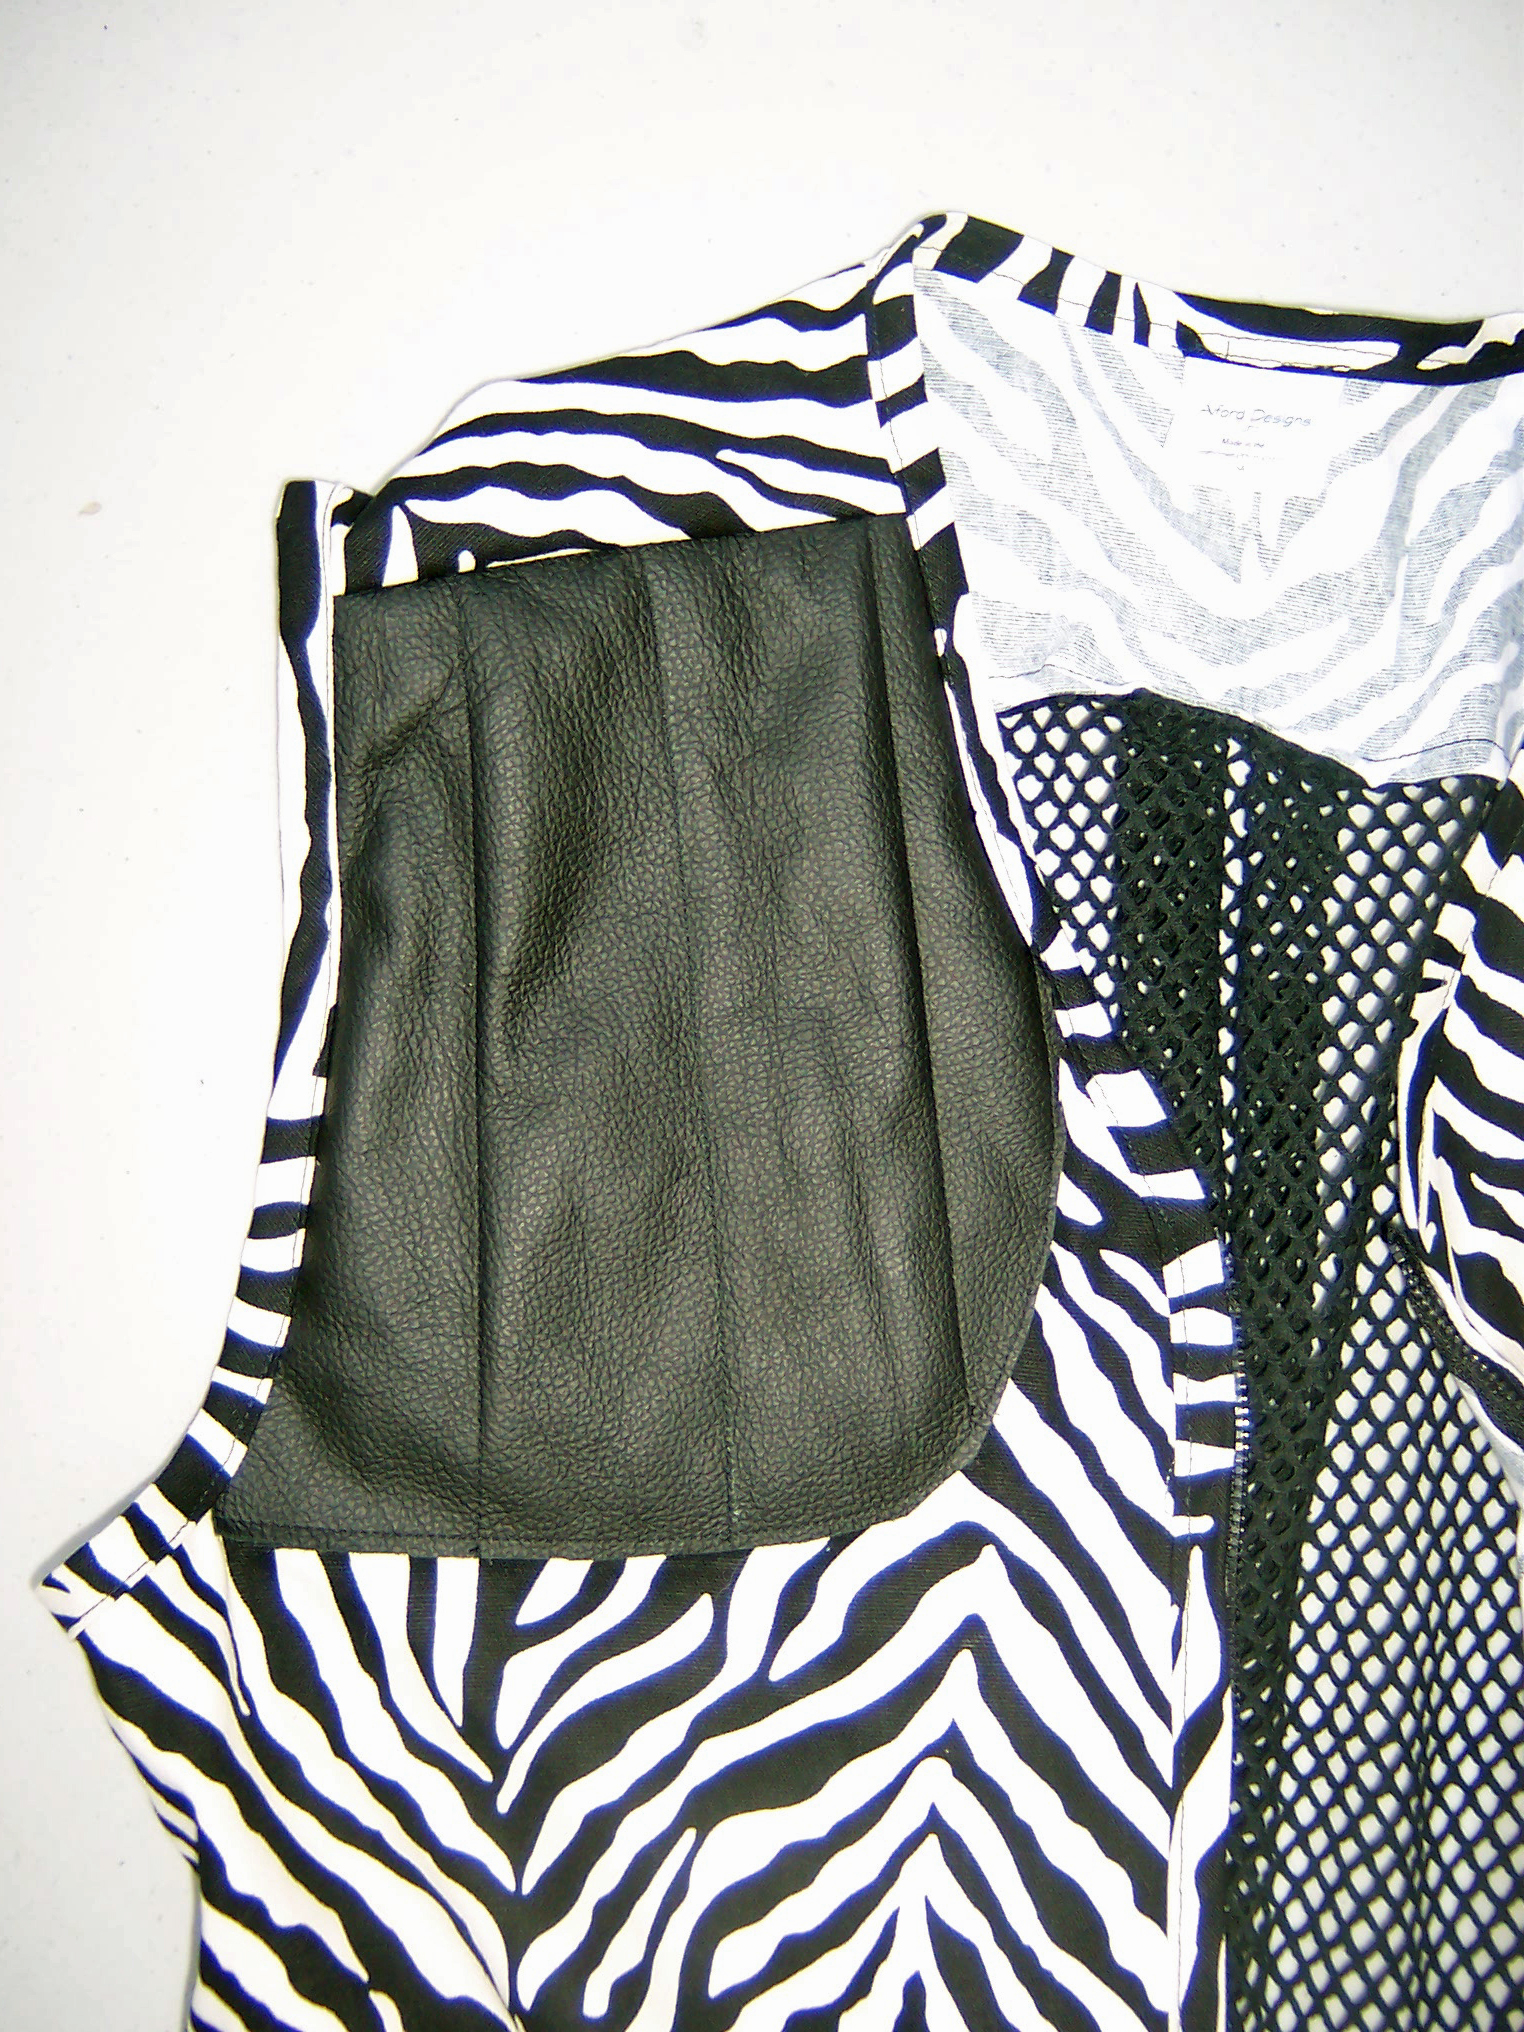 Alfrod Design vest padding